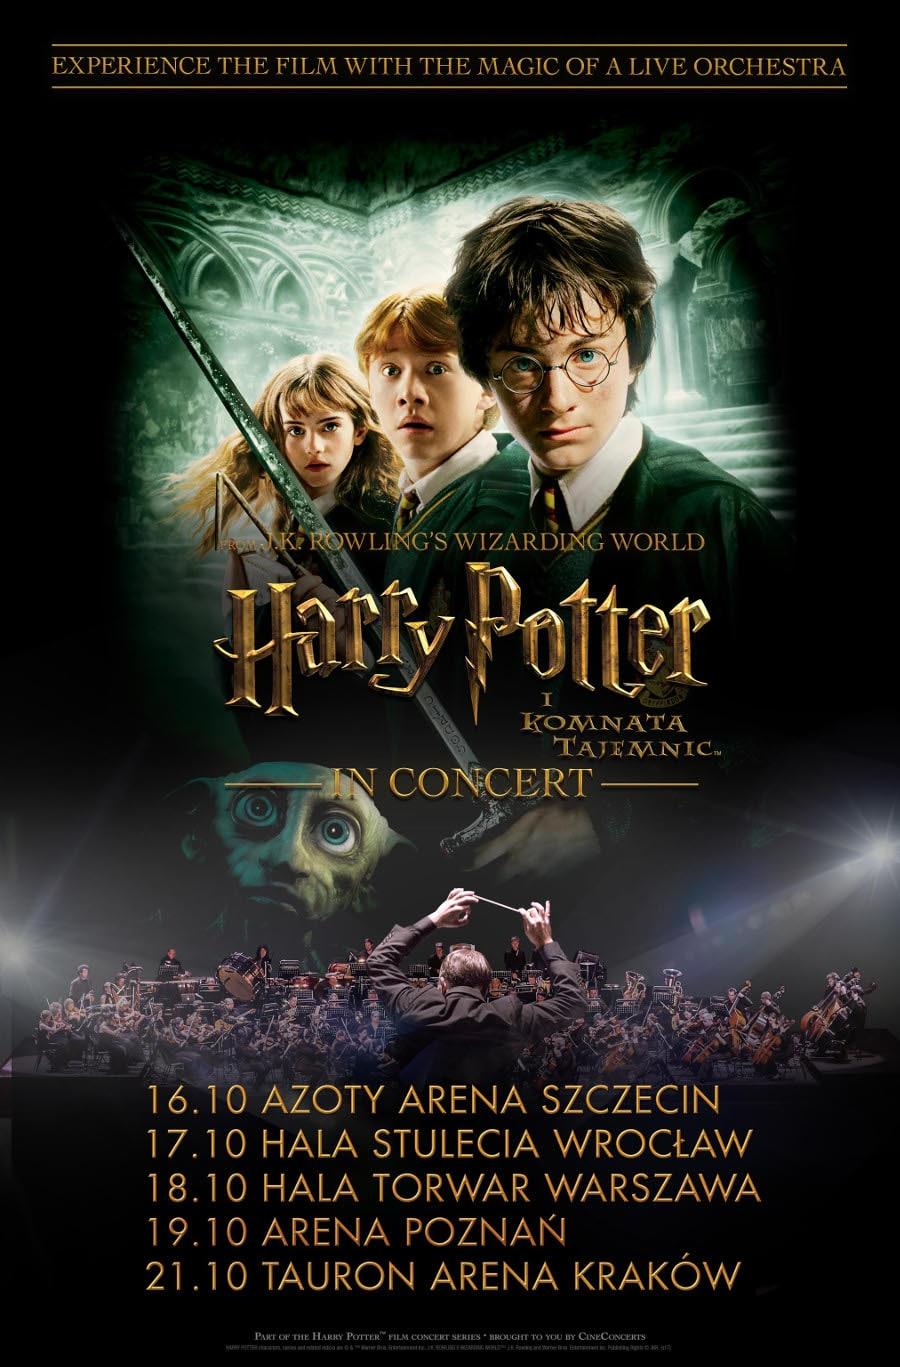 Harry Potter i Komnata Tajemnic in Concert